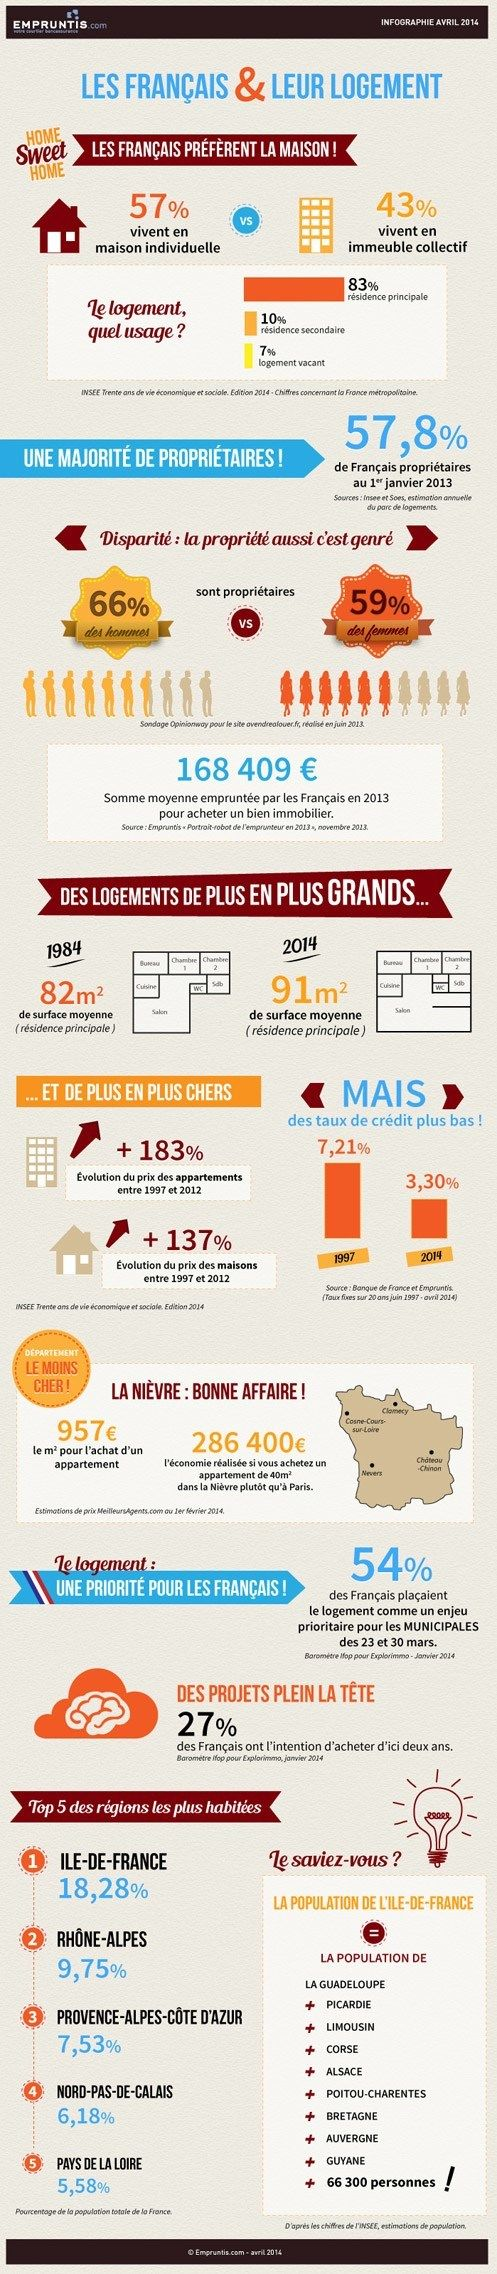 L'immobilier en France